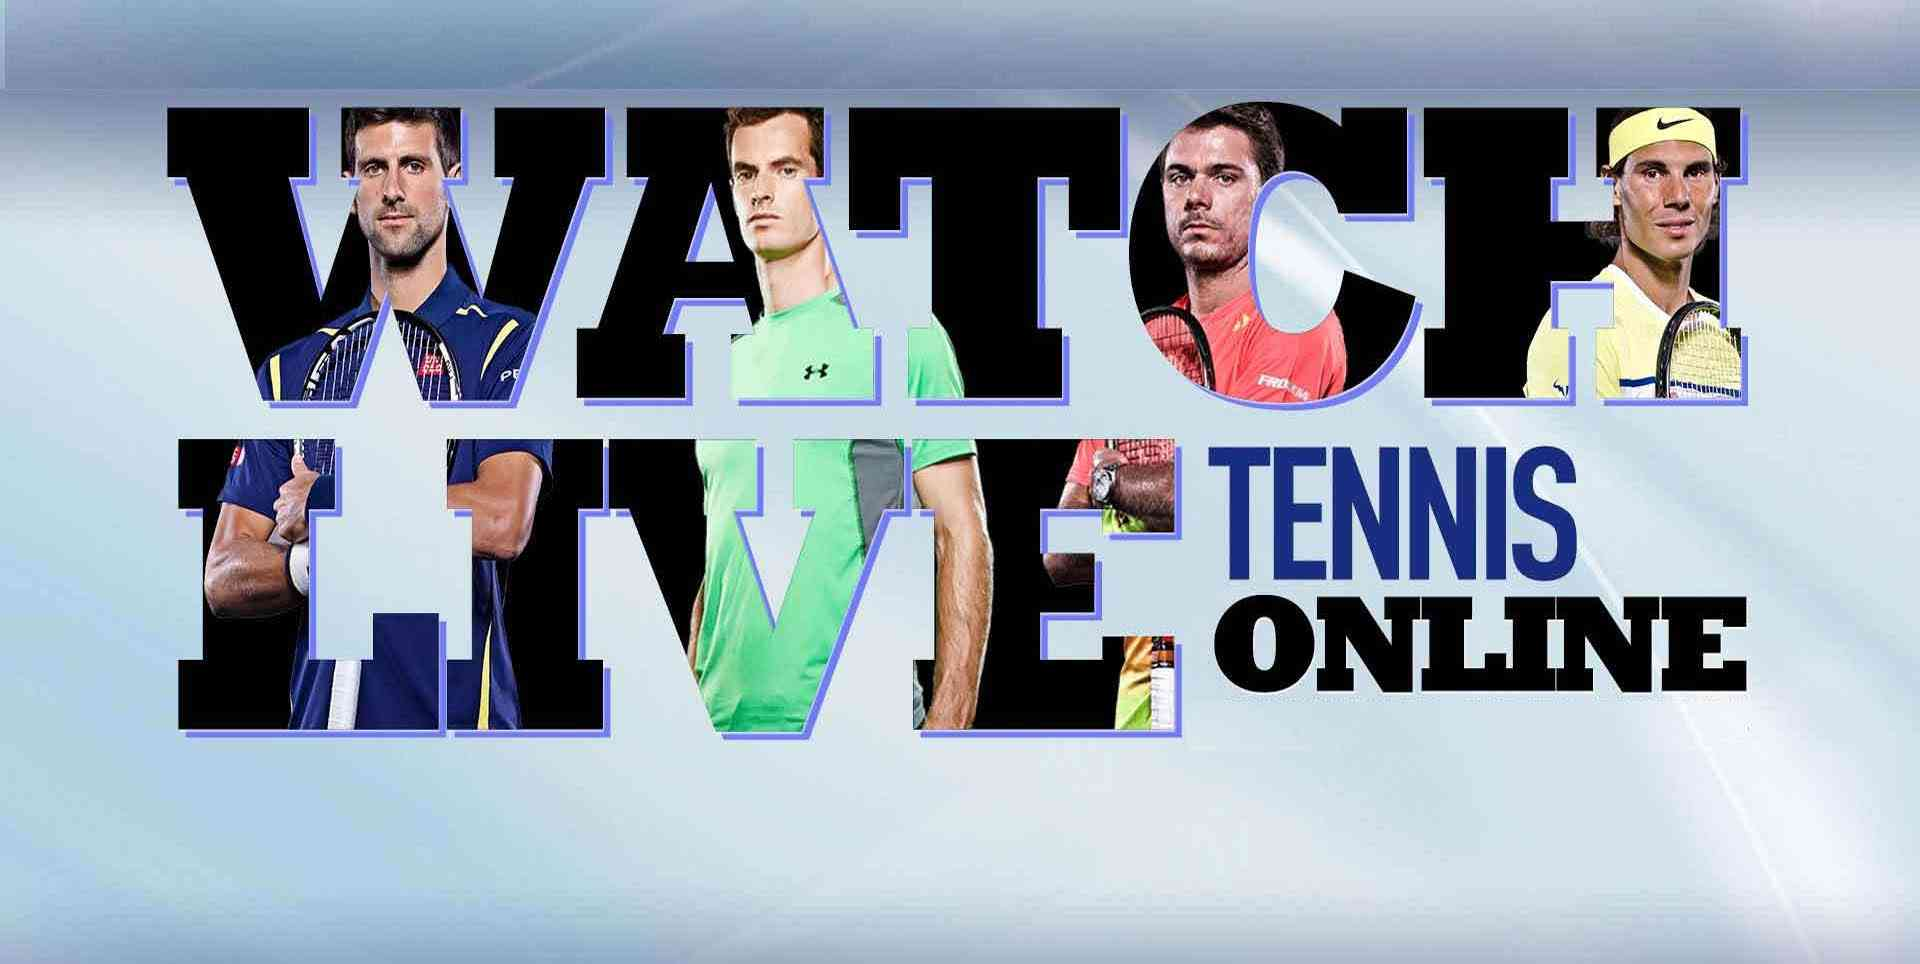 Live L. Mayer vs P. Kohlschreiber Semi Final Online